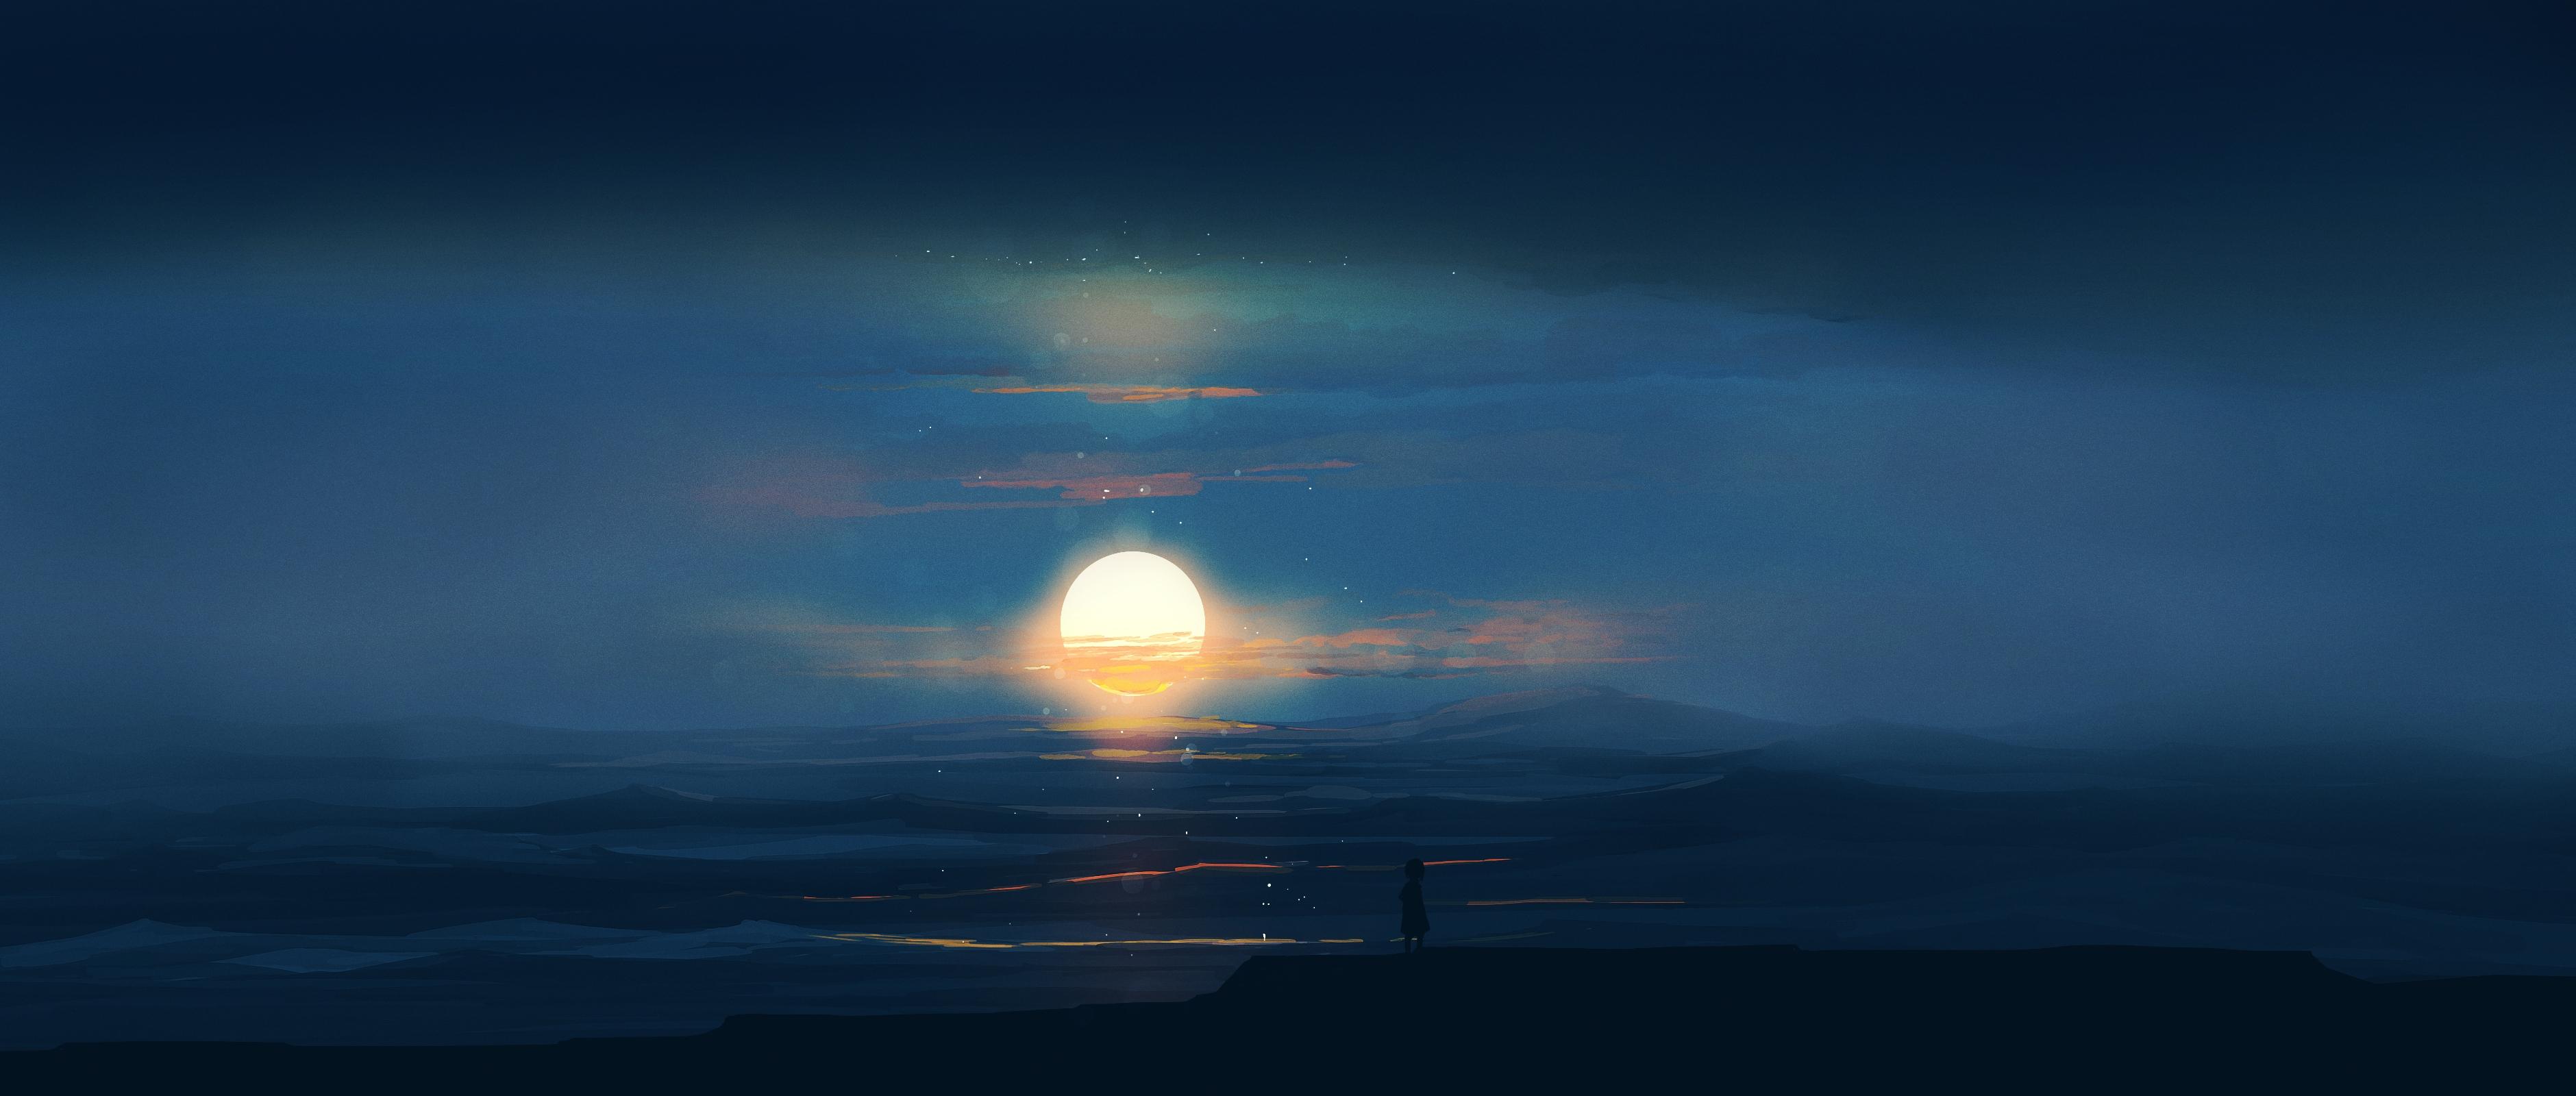 Wallpaper Anime Landscape Sun 3760x1600 Rocketizada